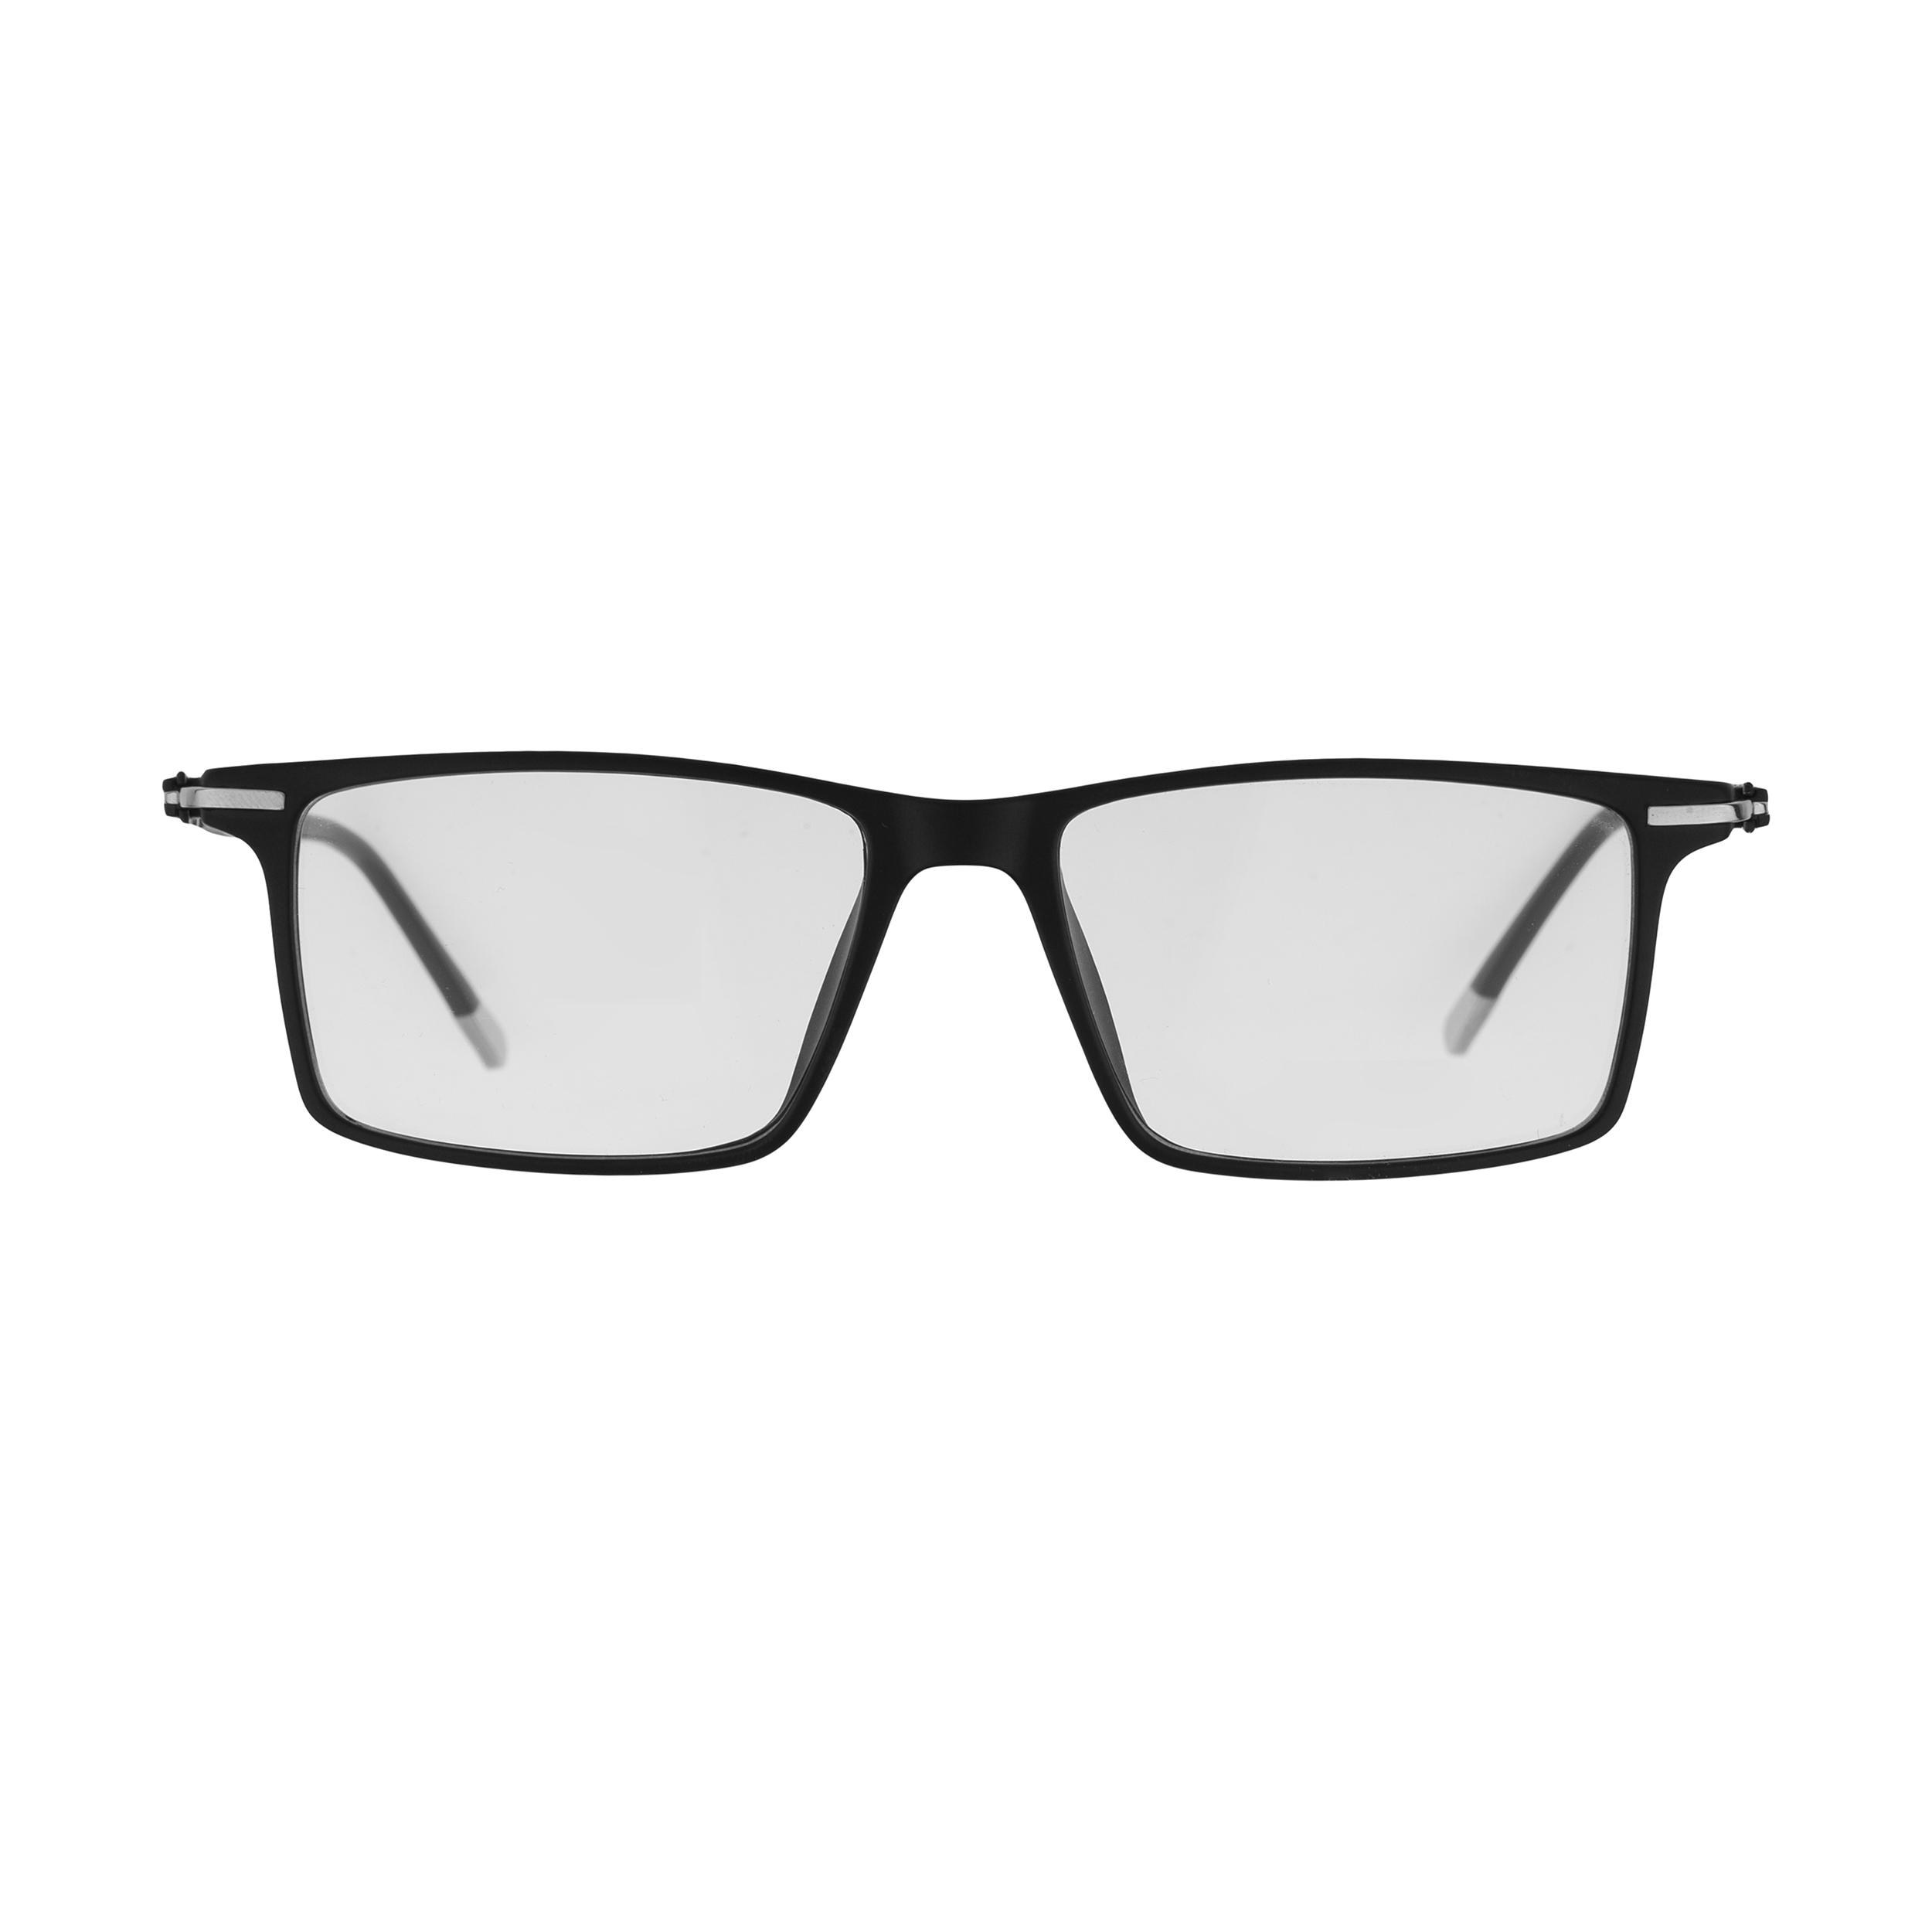 فریم عینک طبی مردانه سیسینیلی مدل IP2035C1